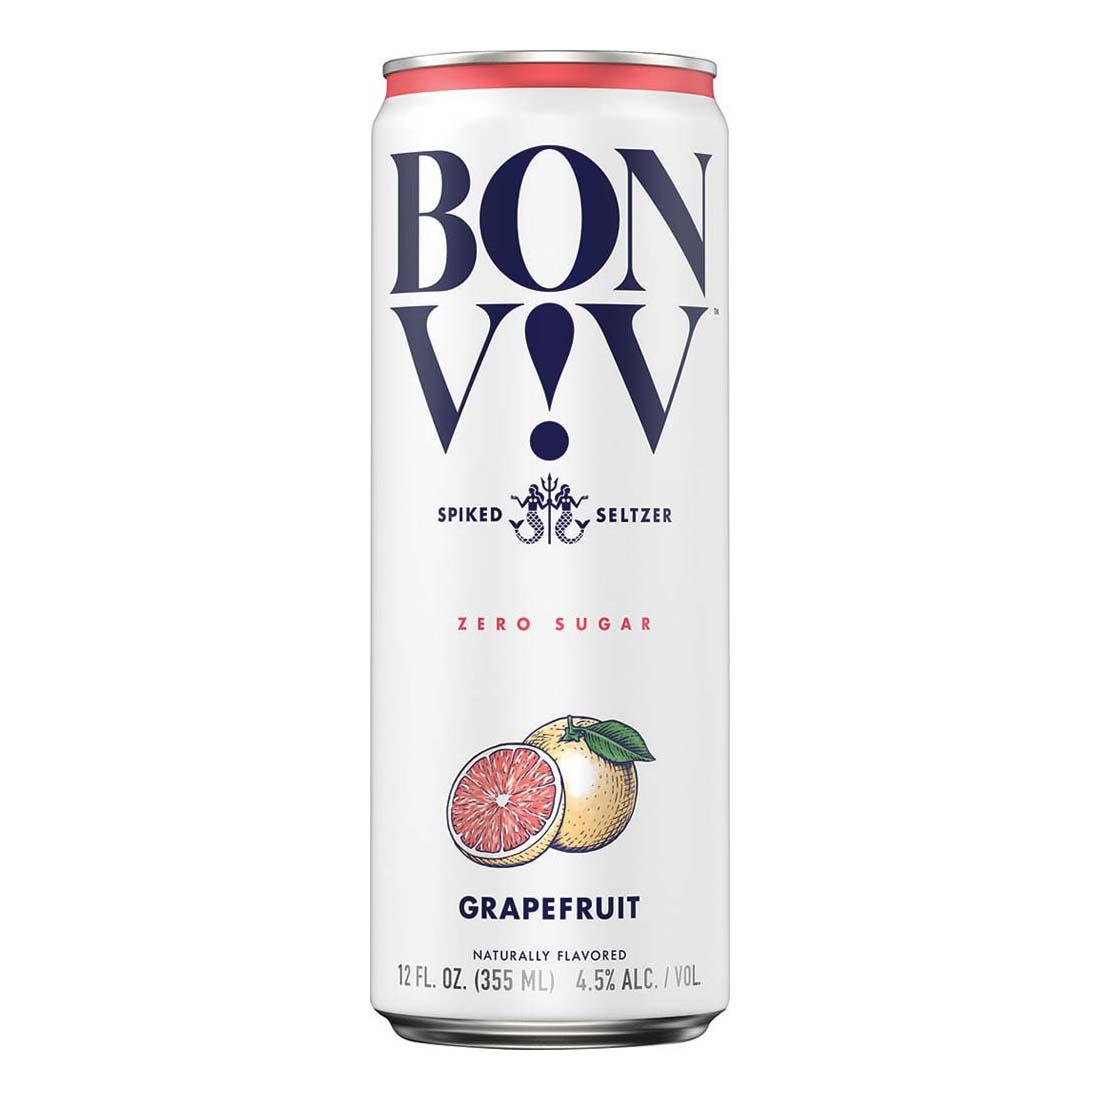 Bon & Viv Spiked Seltzer, Grapefruit